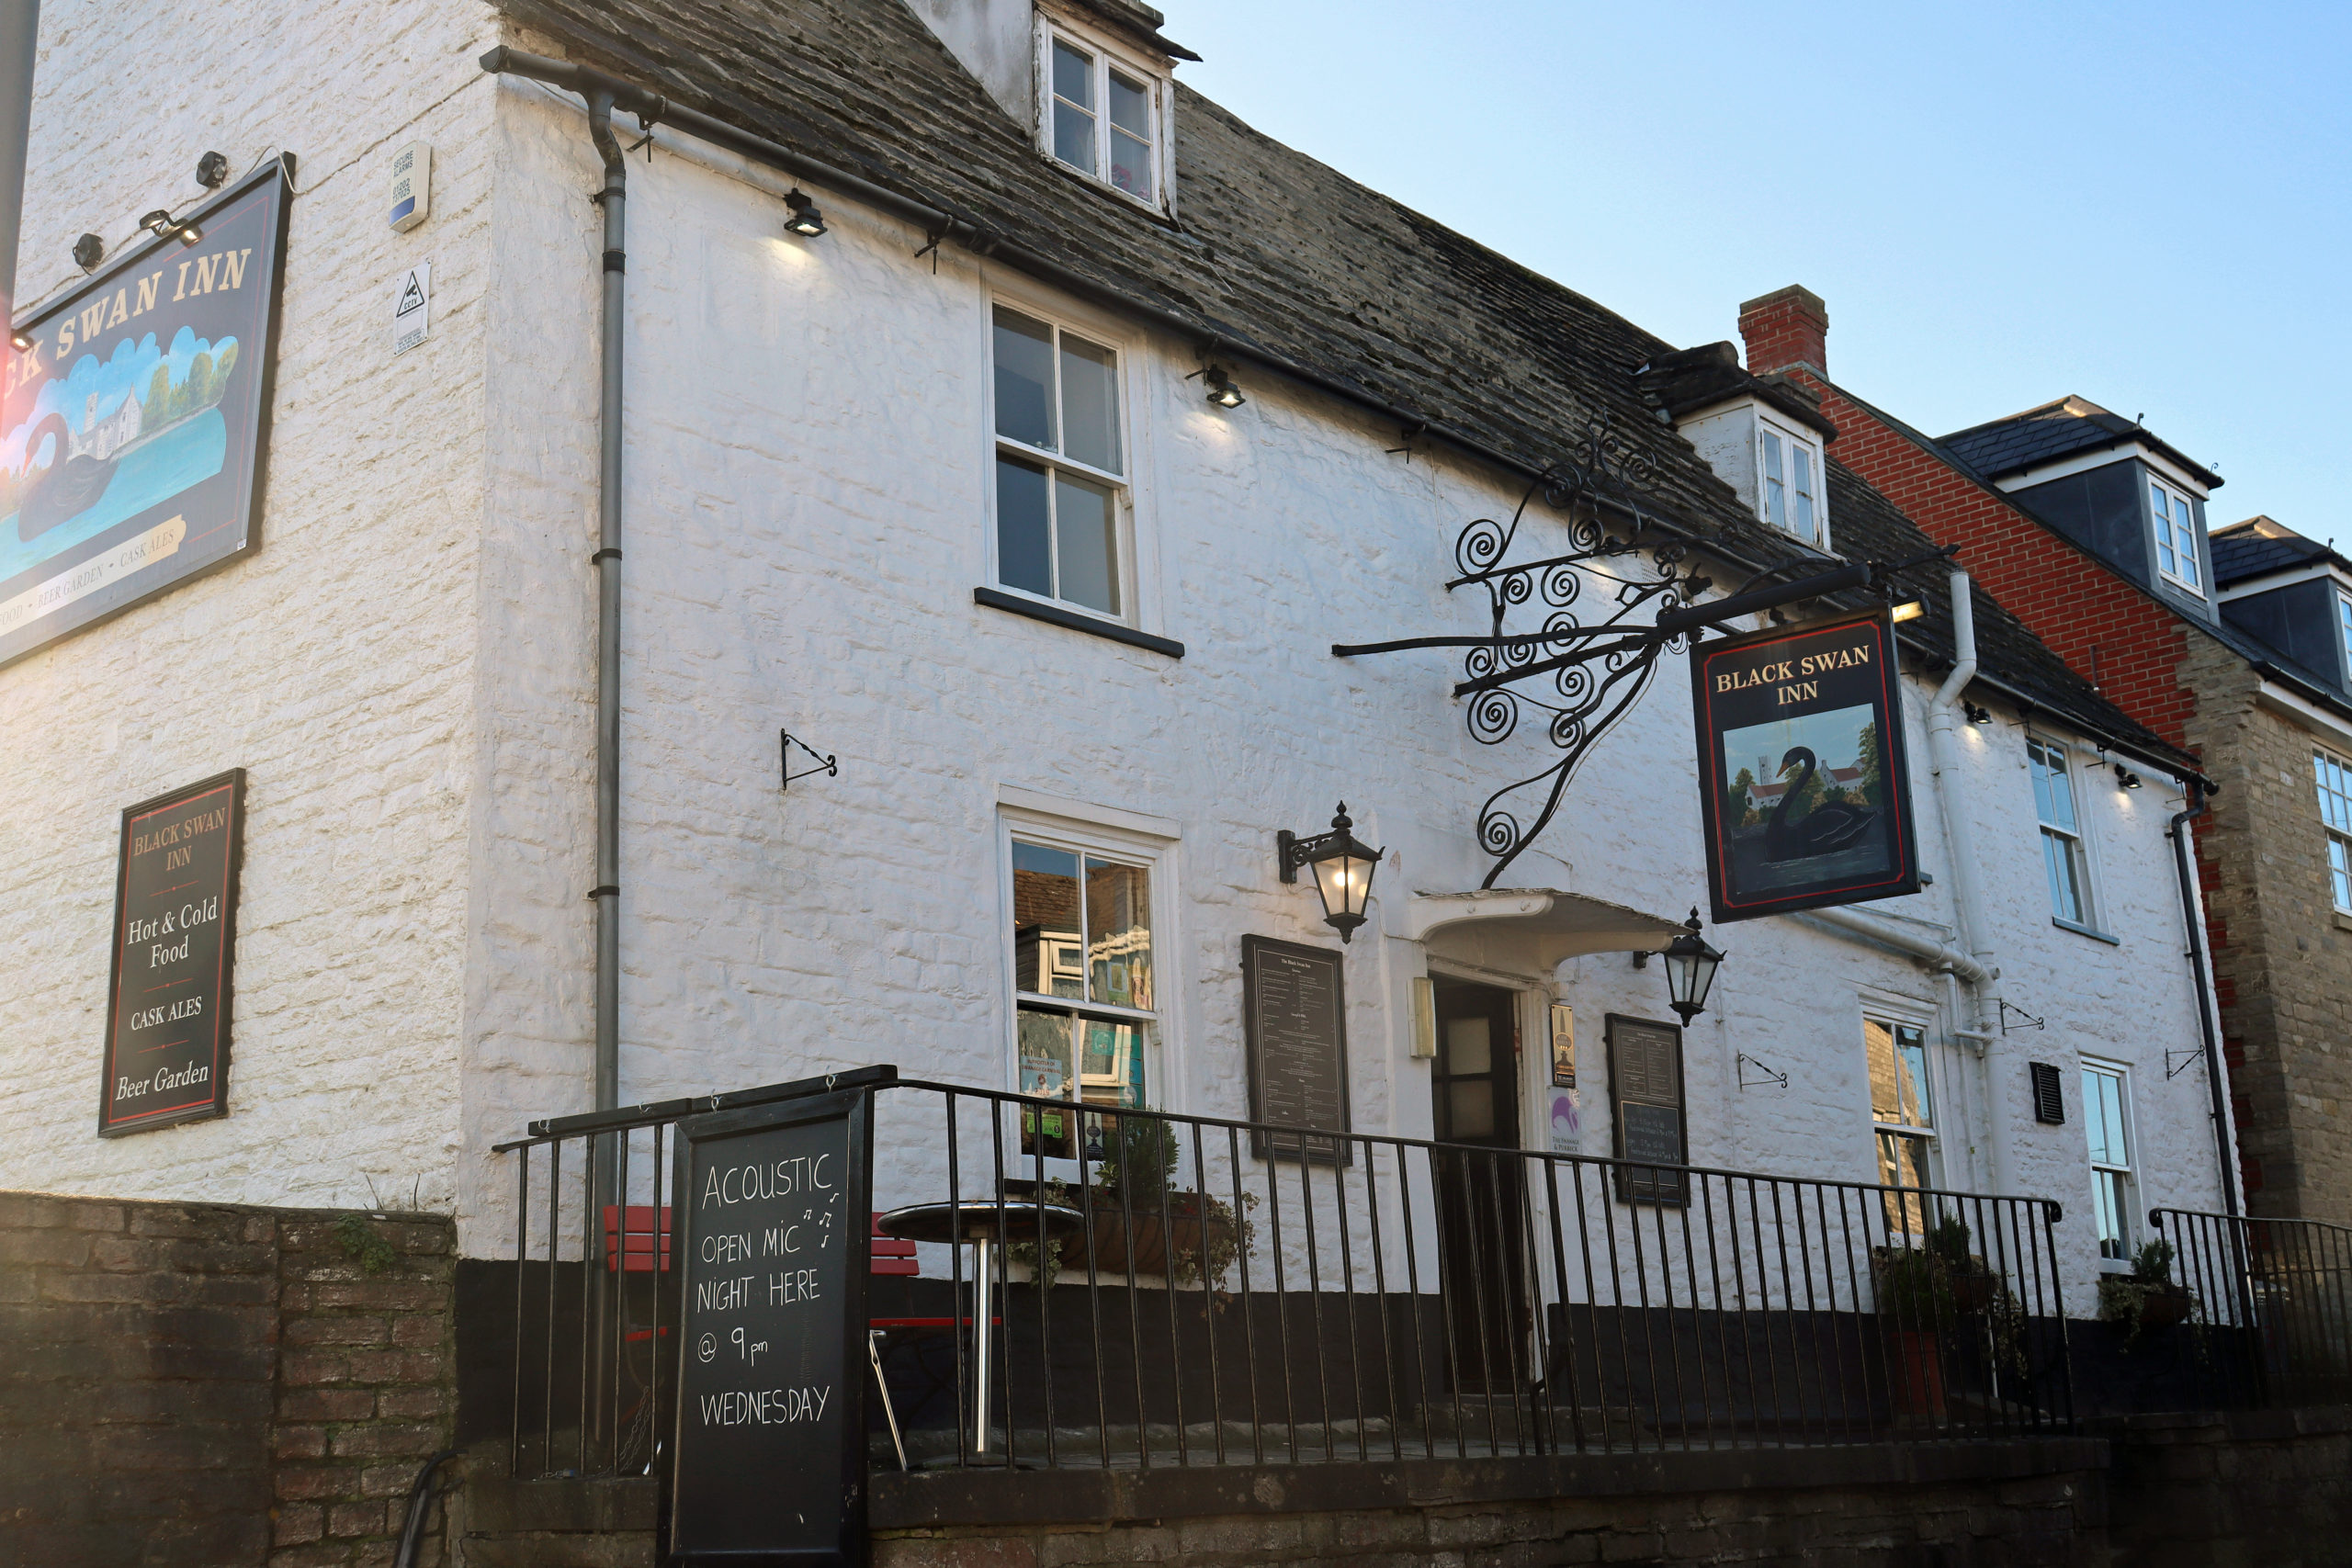 Outside The Black Swan pub